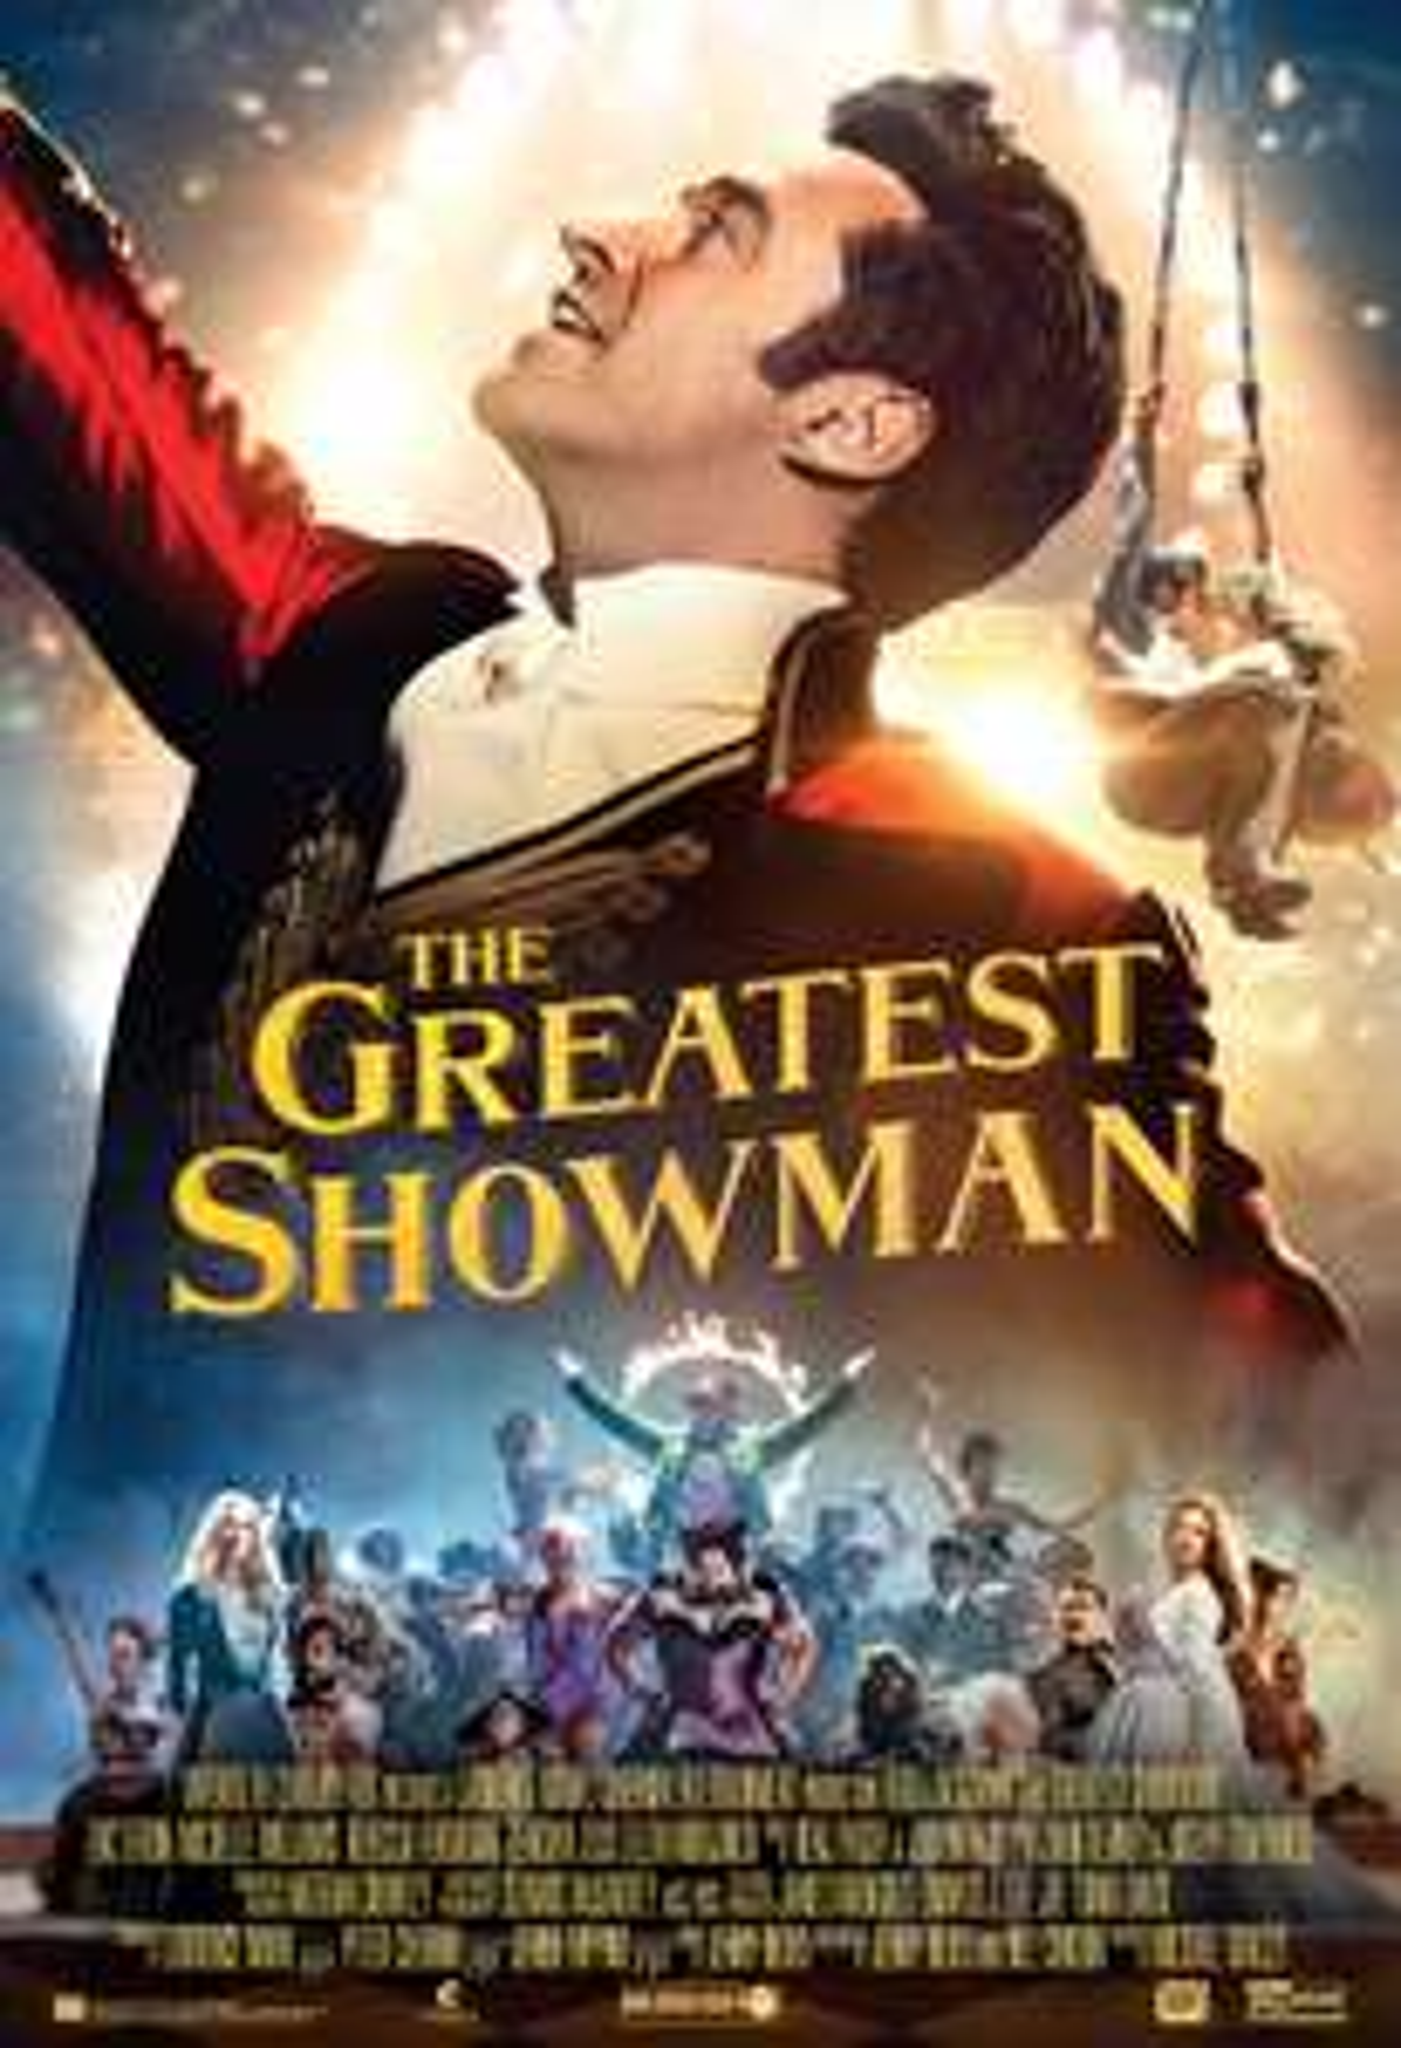 The greatest showman - £4.99 @ Google Play